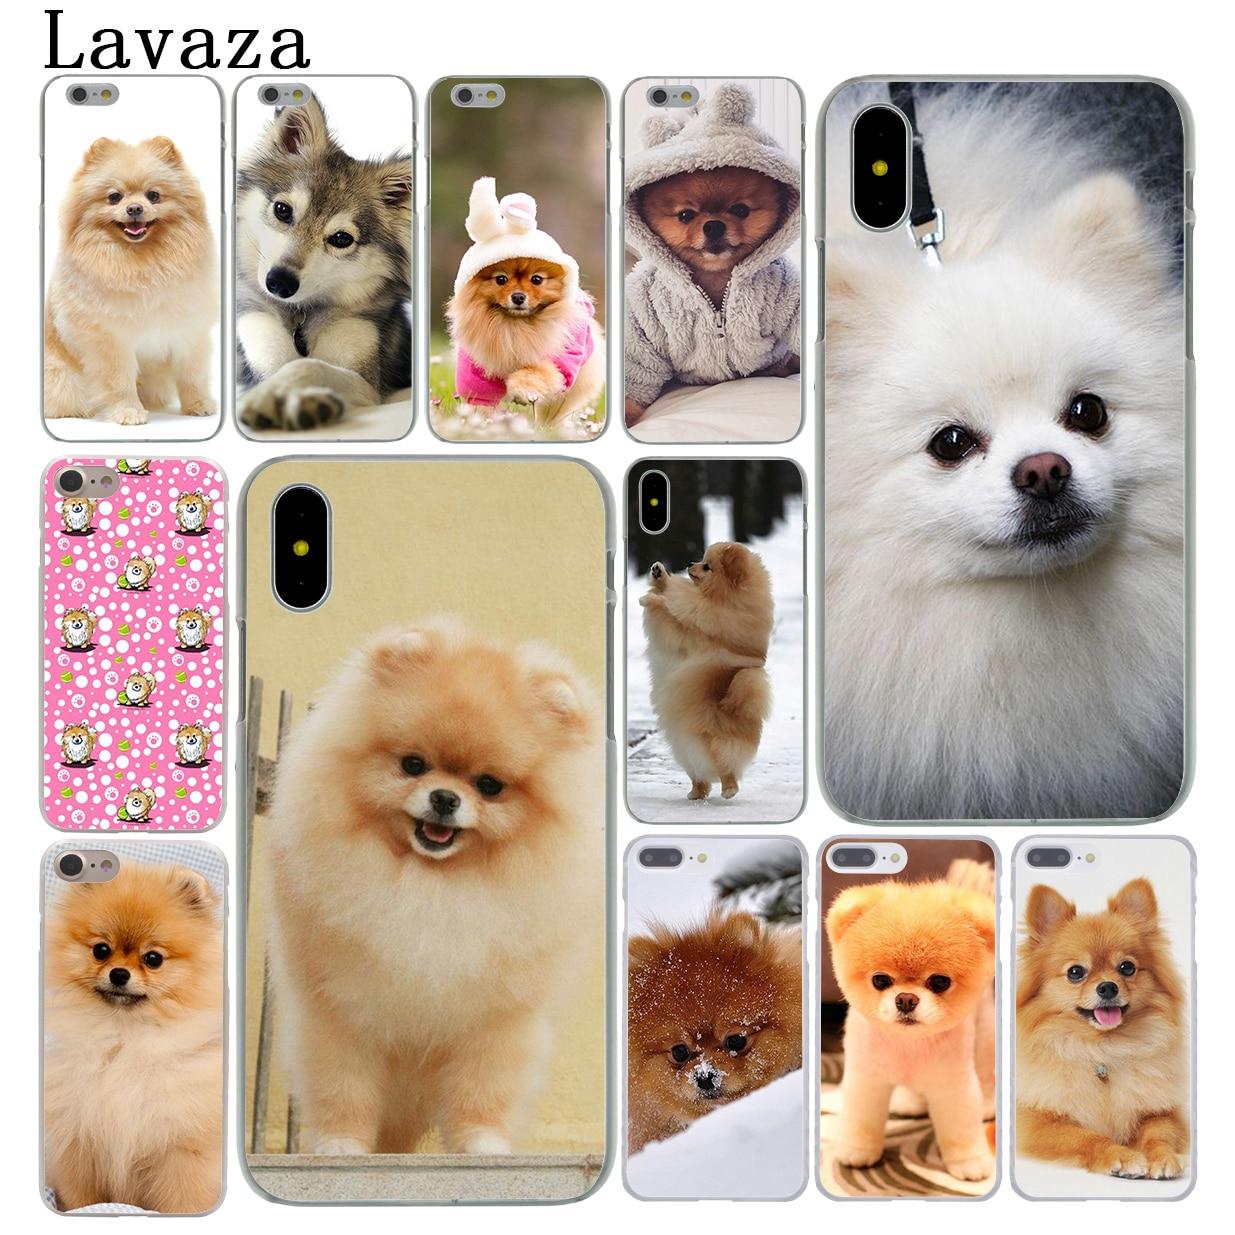 Lavaza Pomeranian dogs dog cute Hard Cover Case for Apple